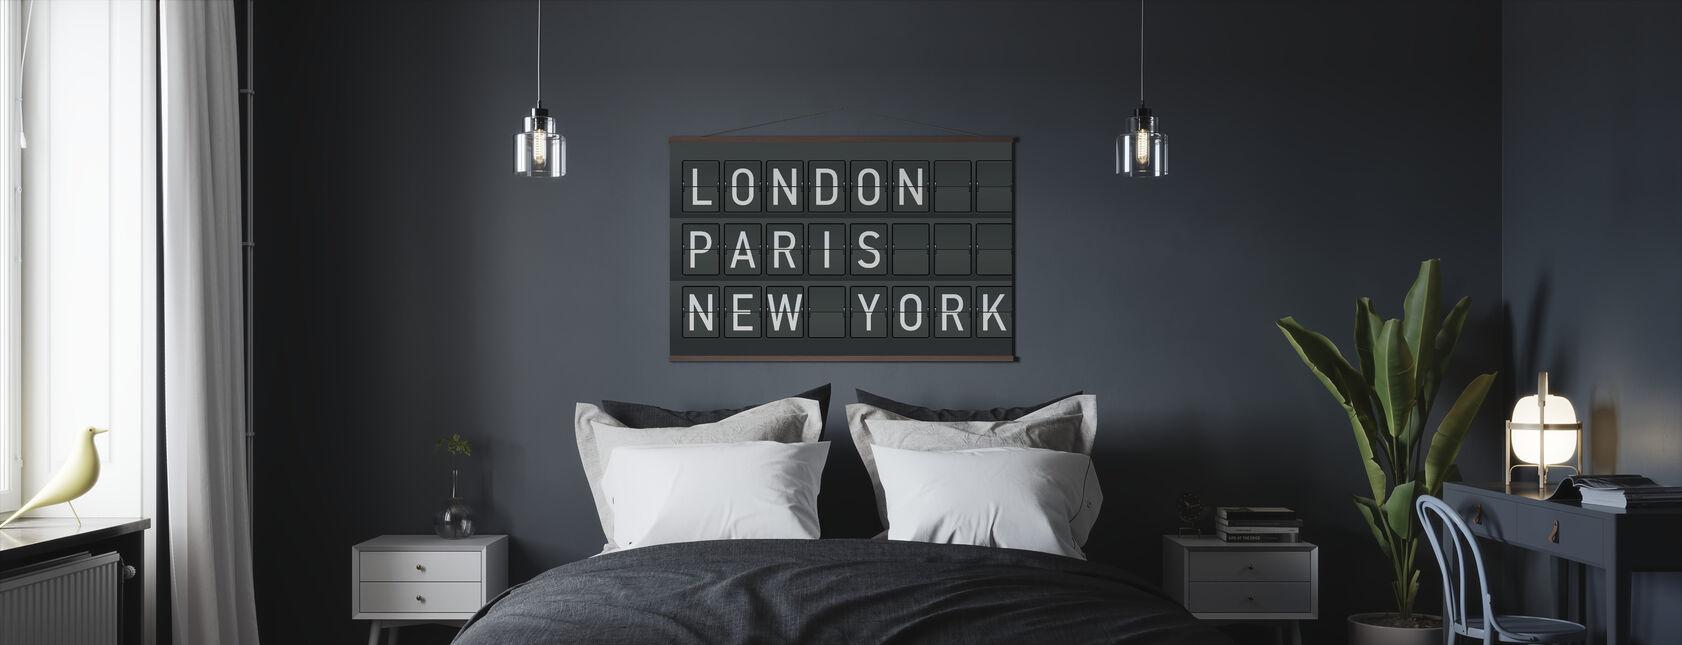 London - Paris - New York - Poster - Bedroom